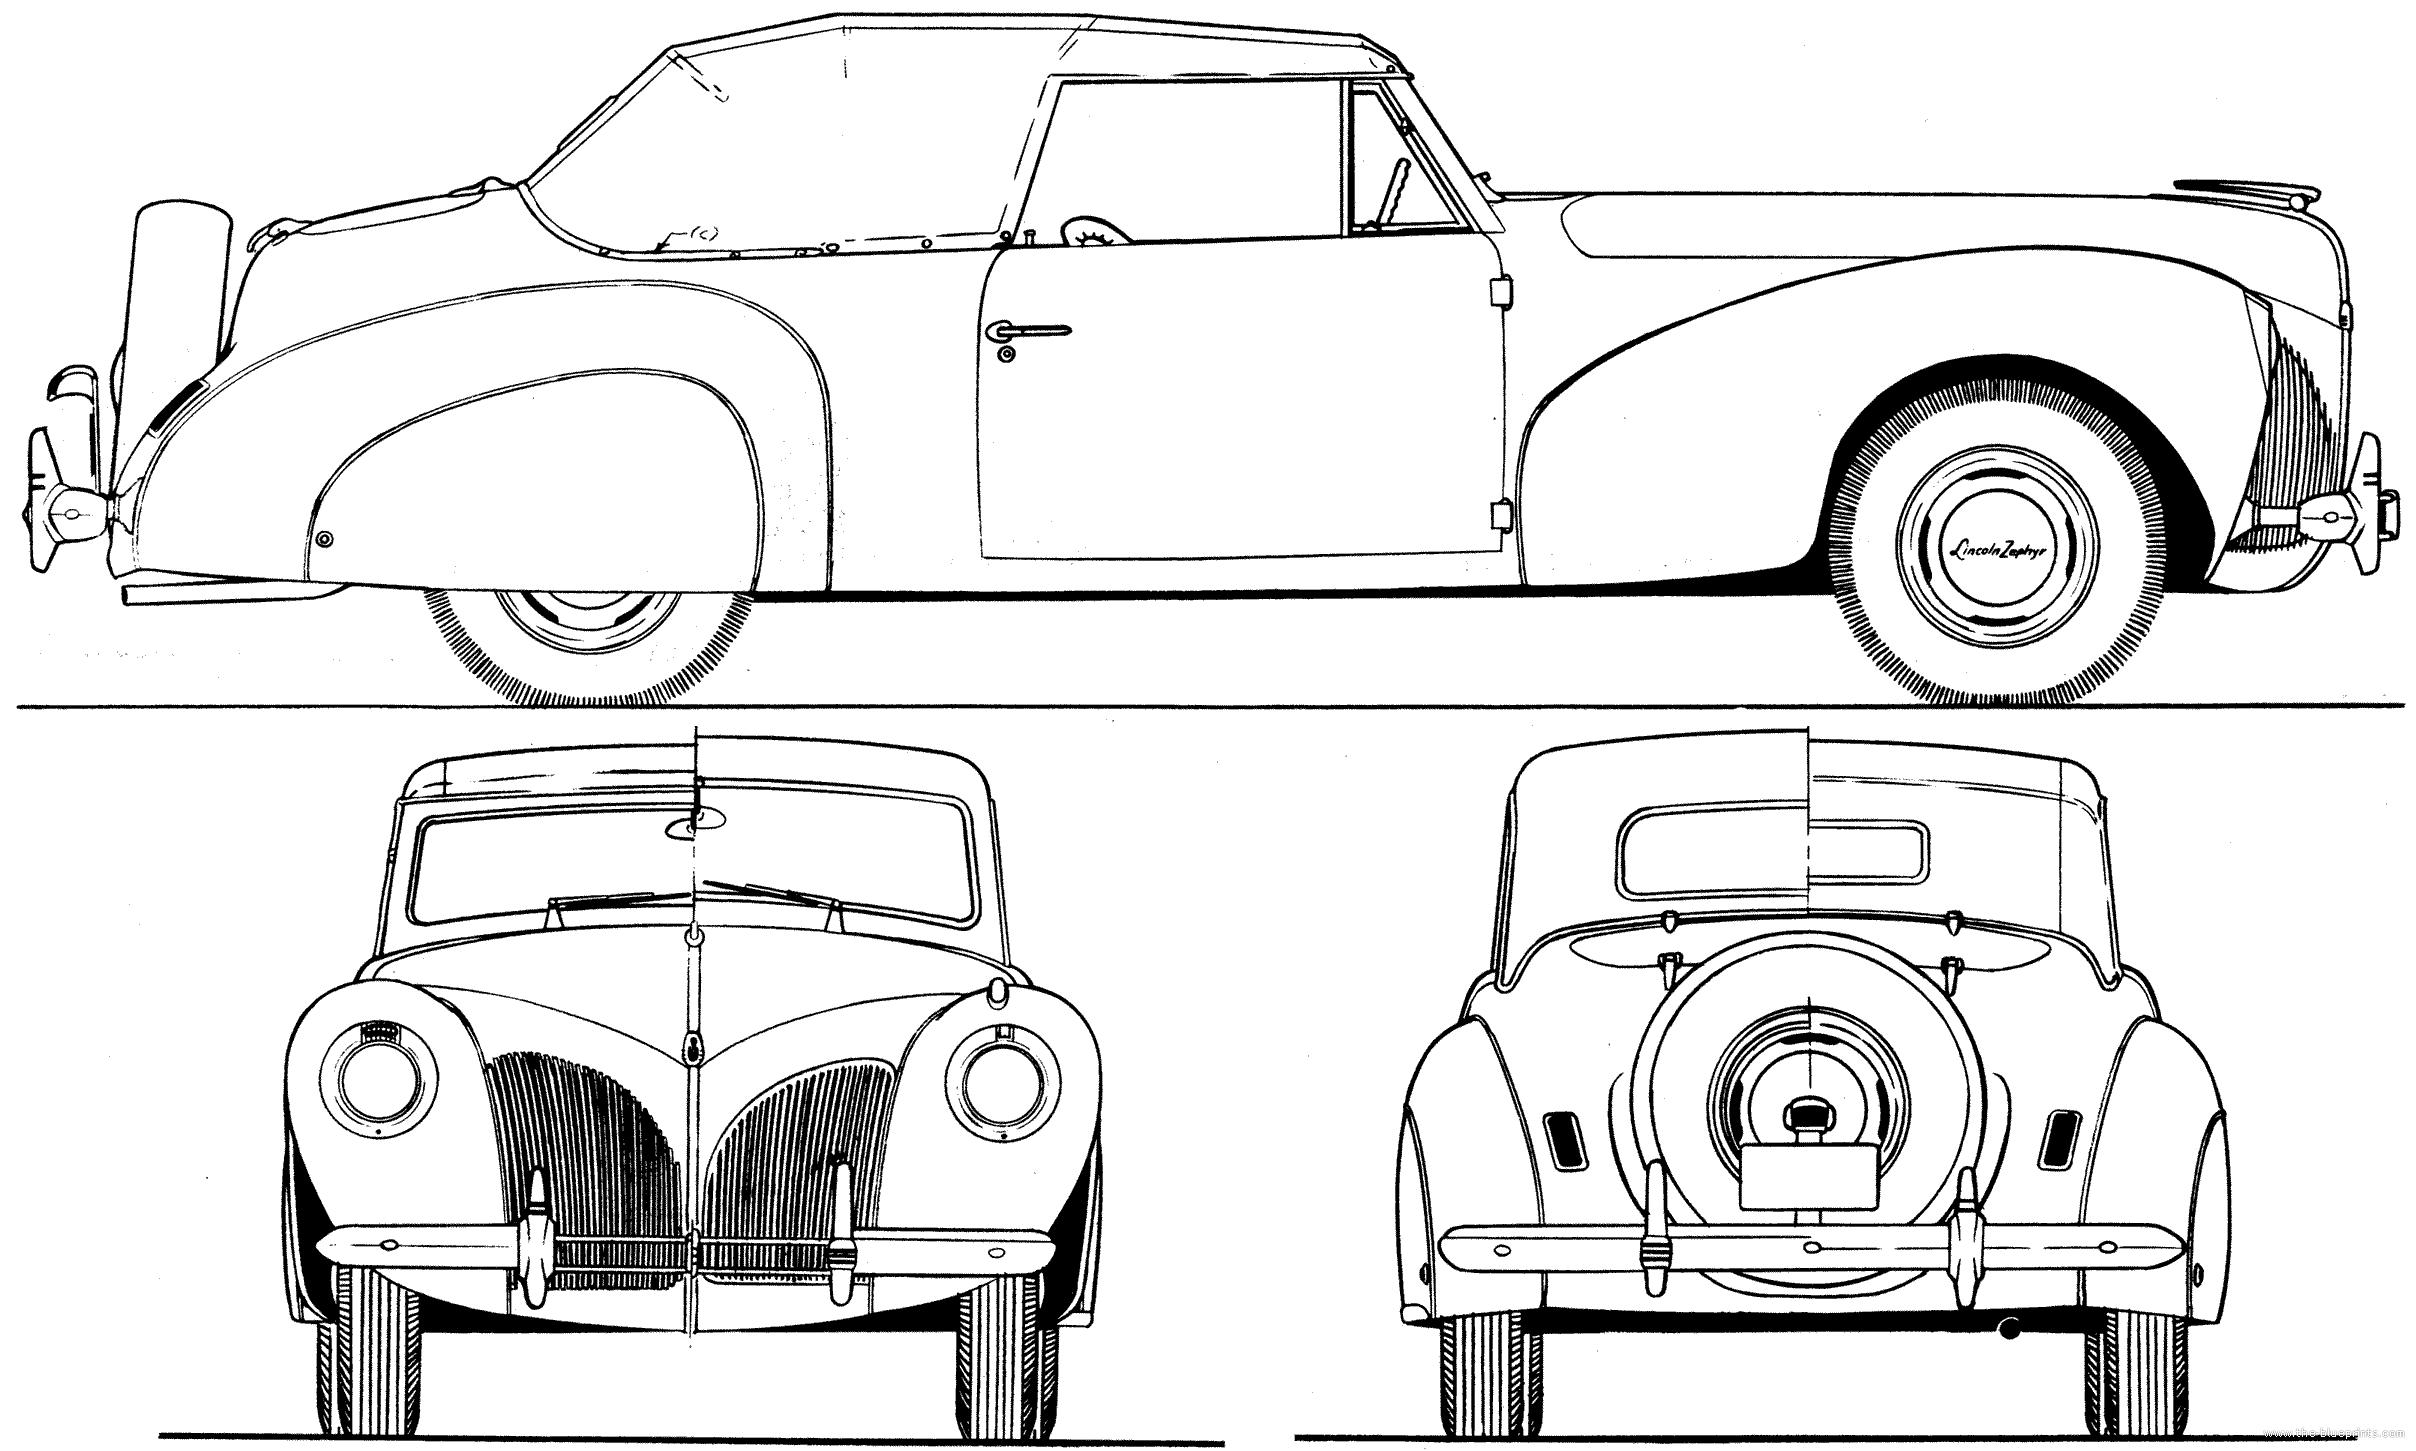 Cars Hudson Hornet Kleurplaat The Blueprints Com Blueprints Gt Cars Gt Lincoln Gt Lincoln